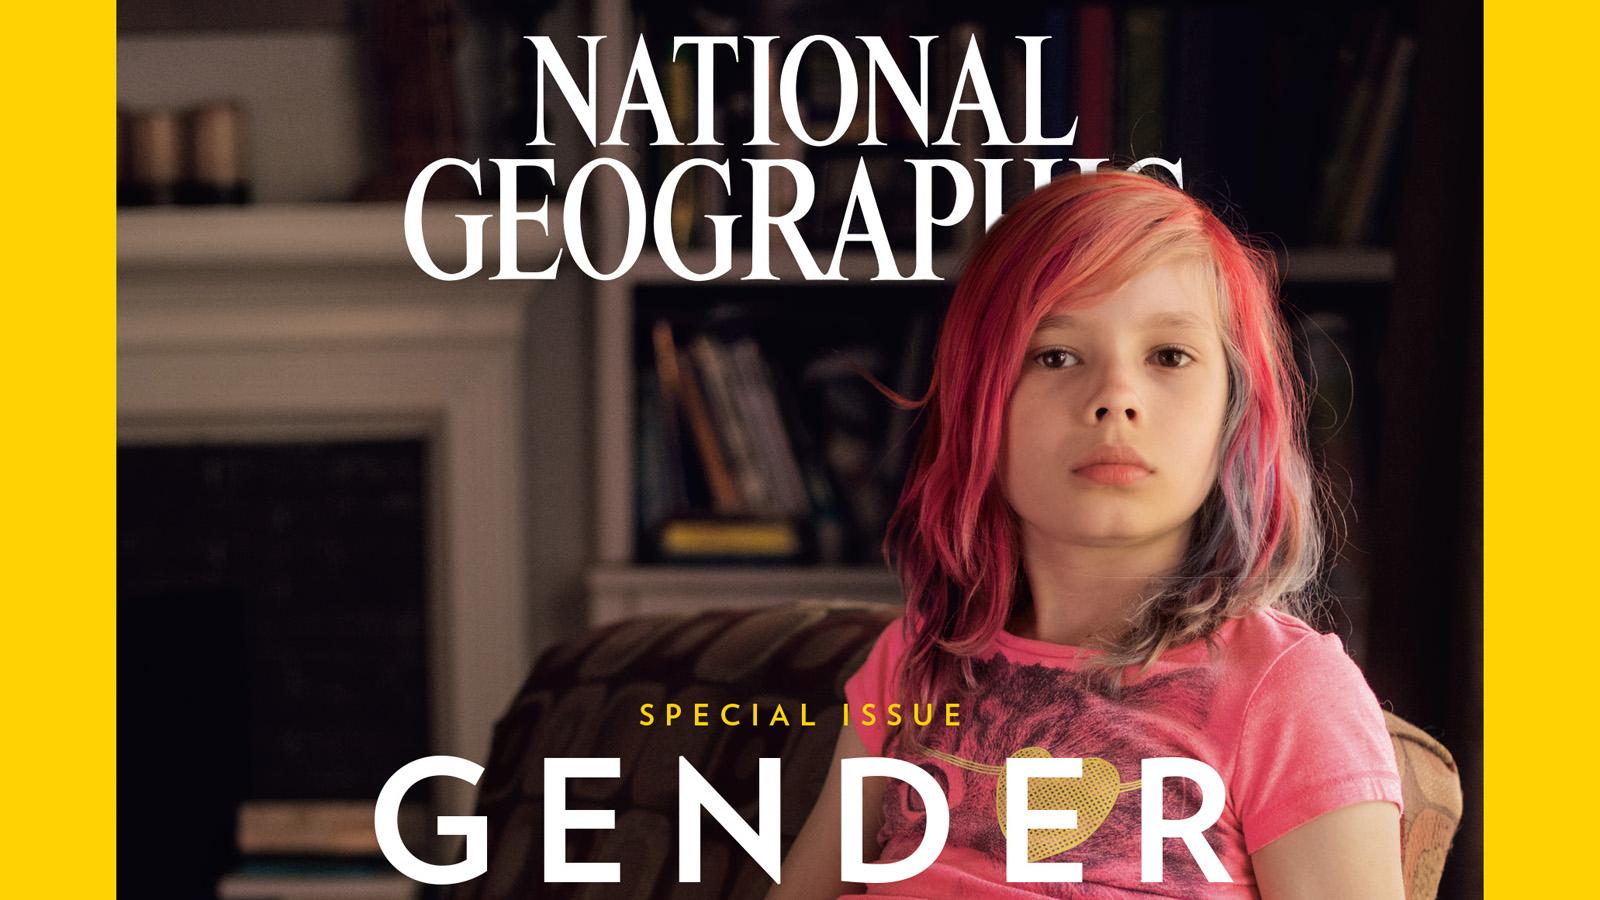 Interesting transsexual topics